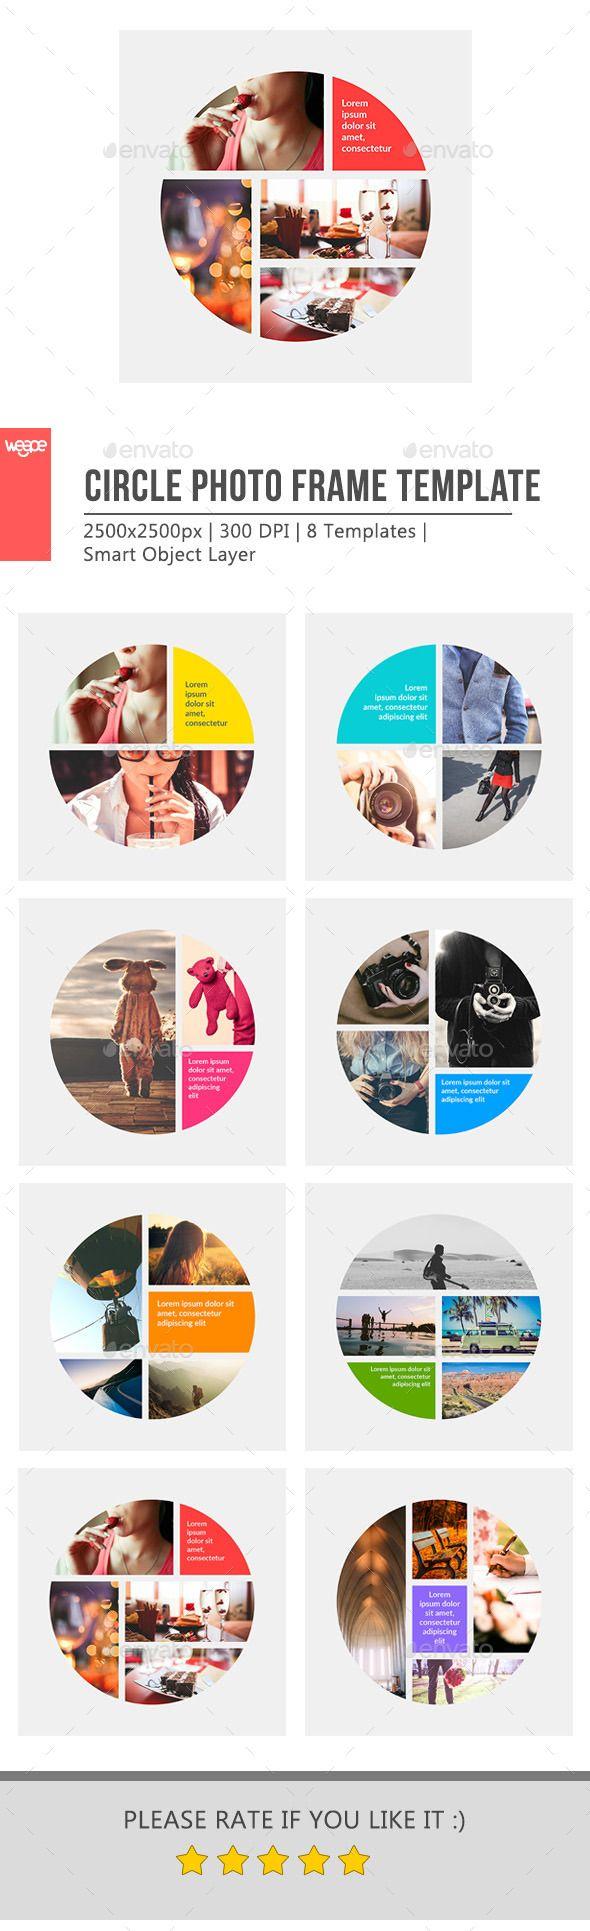 Circle Photo Frame Template | Editorial, Diseño editorial y Forrar ...